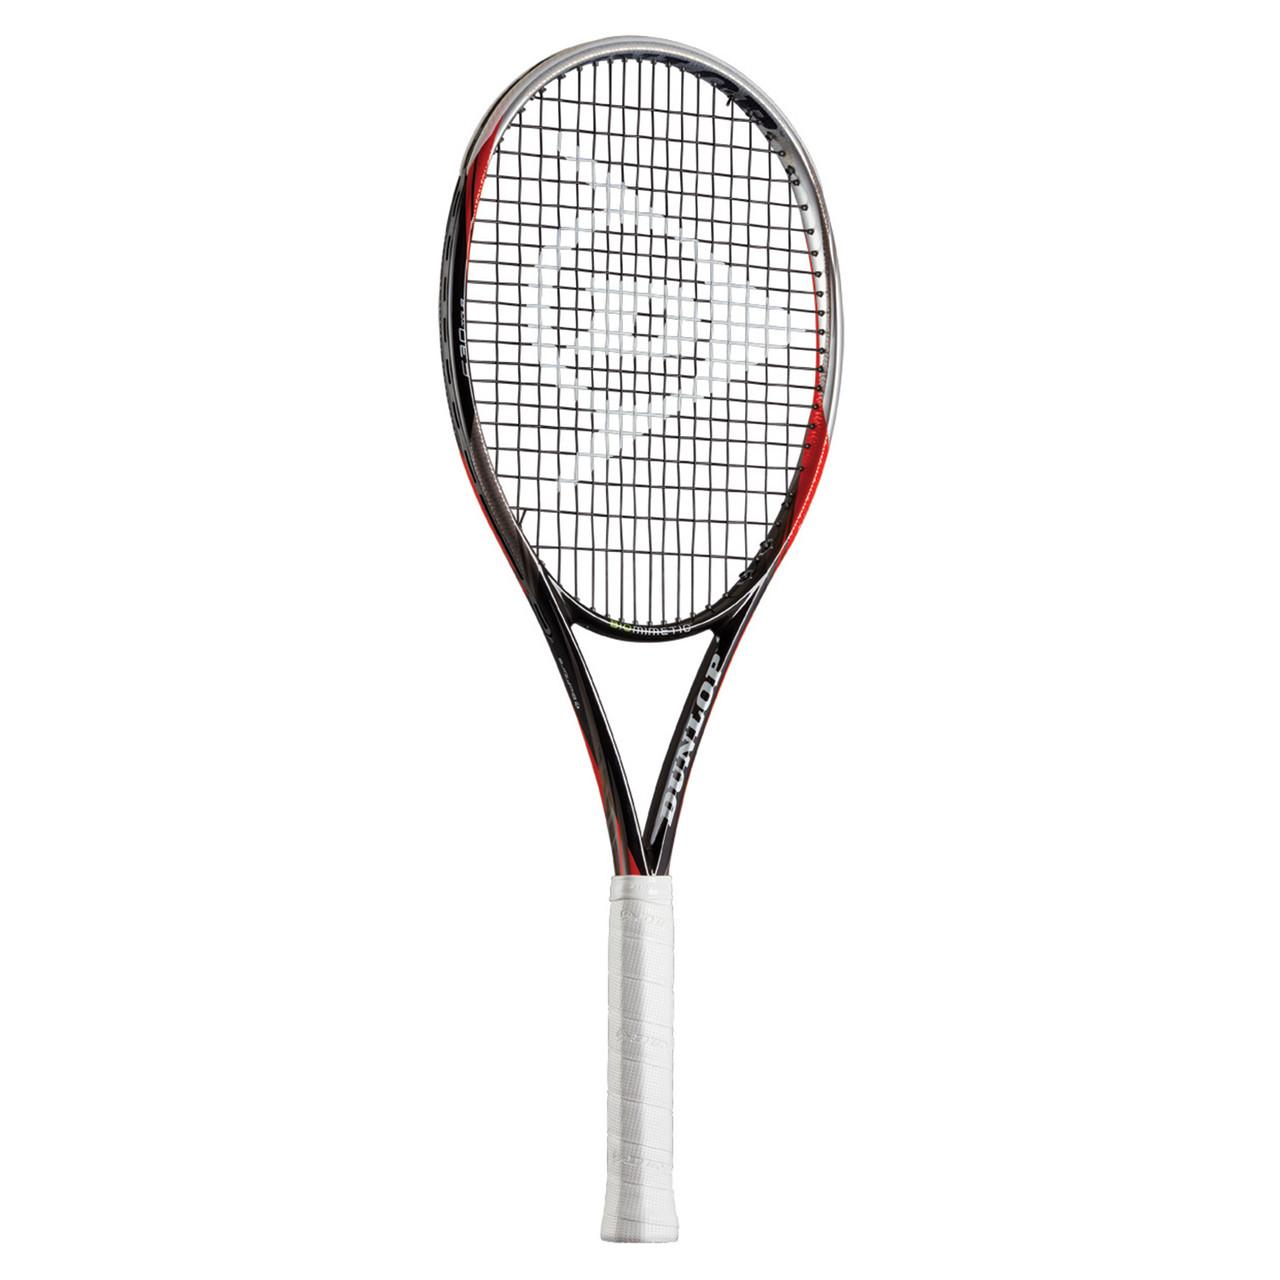 Теннисная ракетка Dunlop D Tr Biomimetic F3.0 Tour G2 Hl 676243-NC